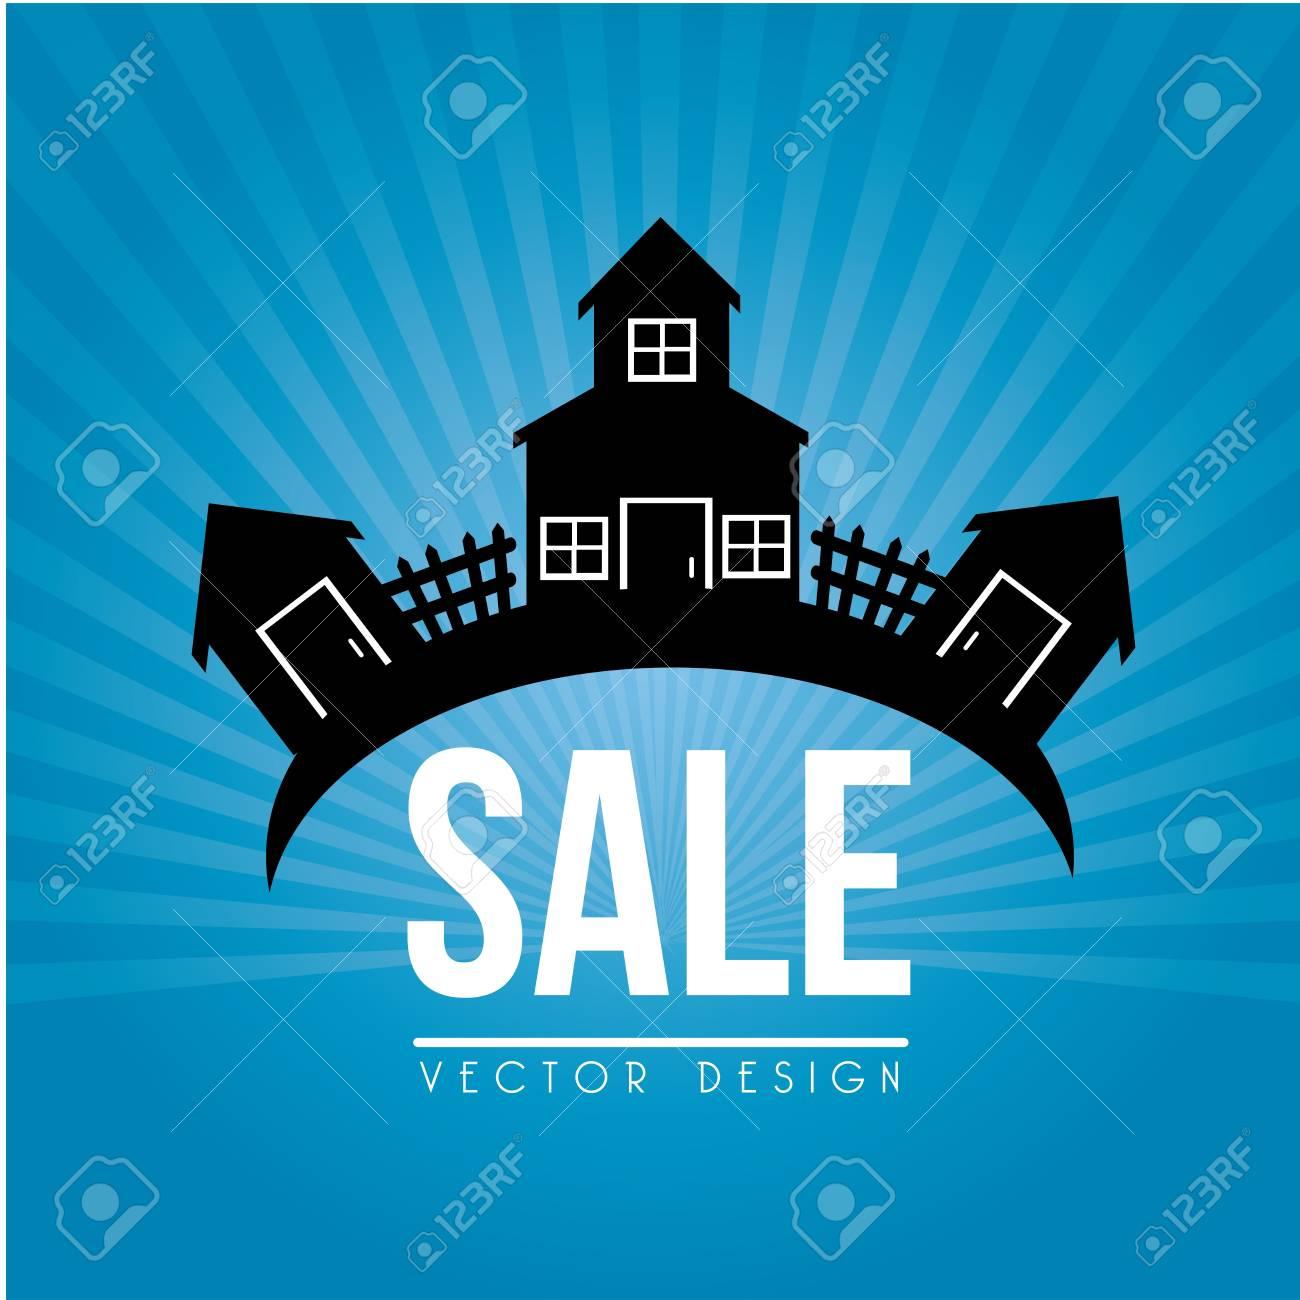 house for sale design over blue background vector illustration Stock Vector - 20500664